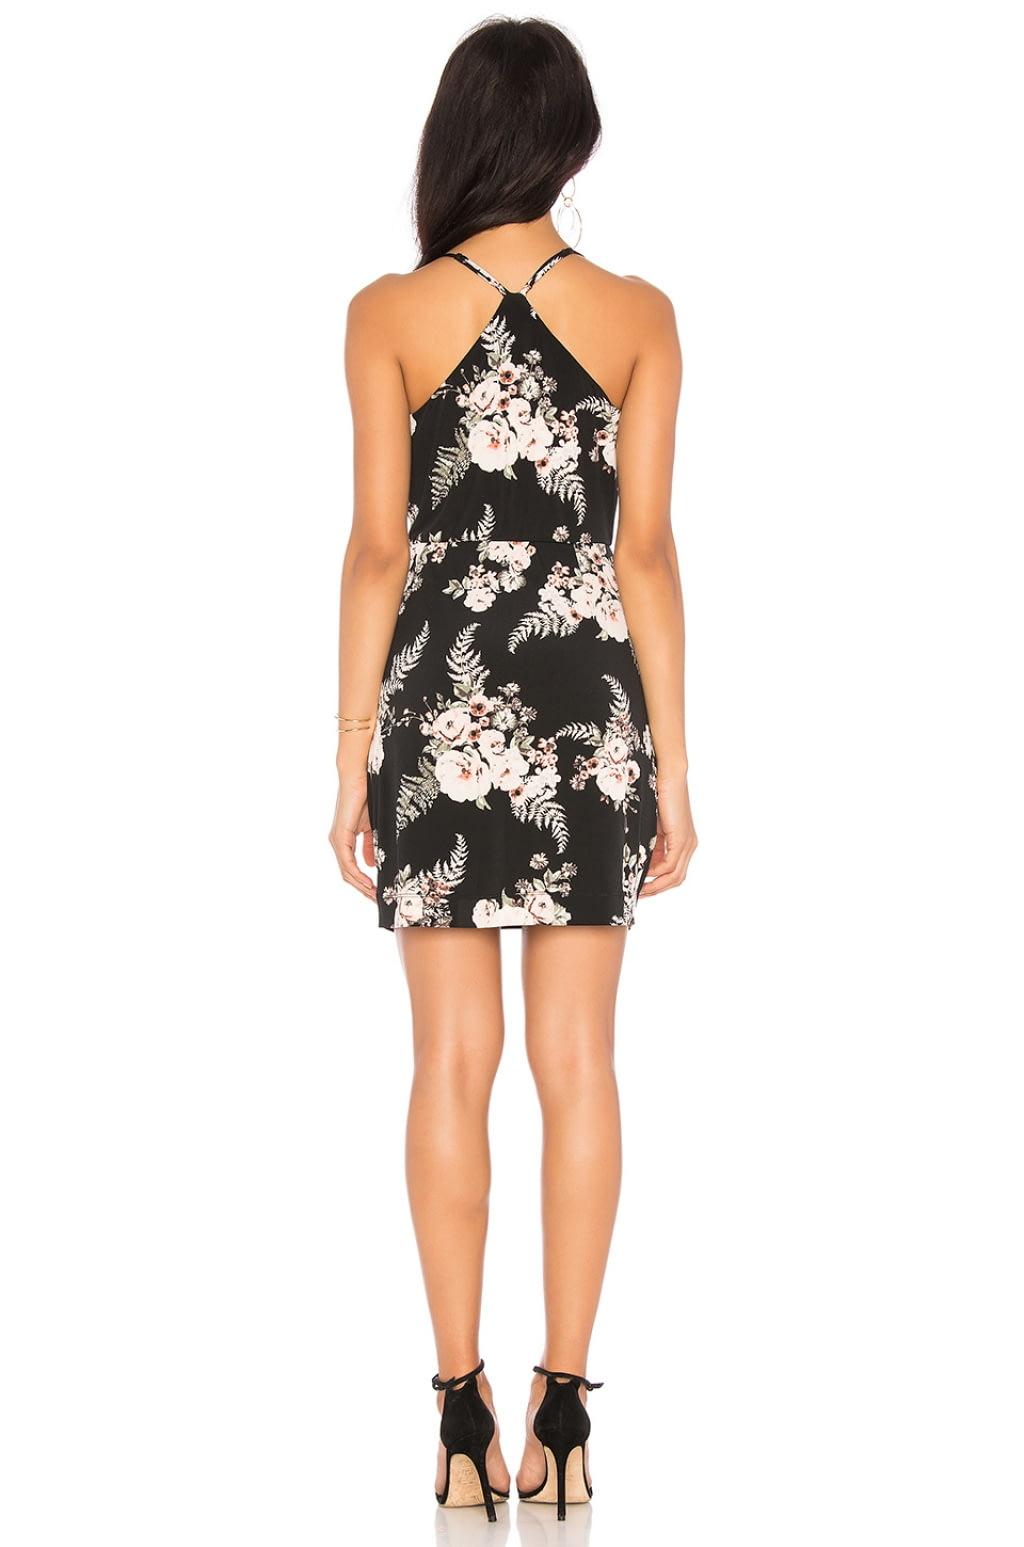 Buy Original Bcbgeneration Faux Wrap Dress At Indonesia Bobobobo Atsthelabel Eeva Black Top